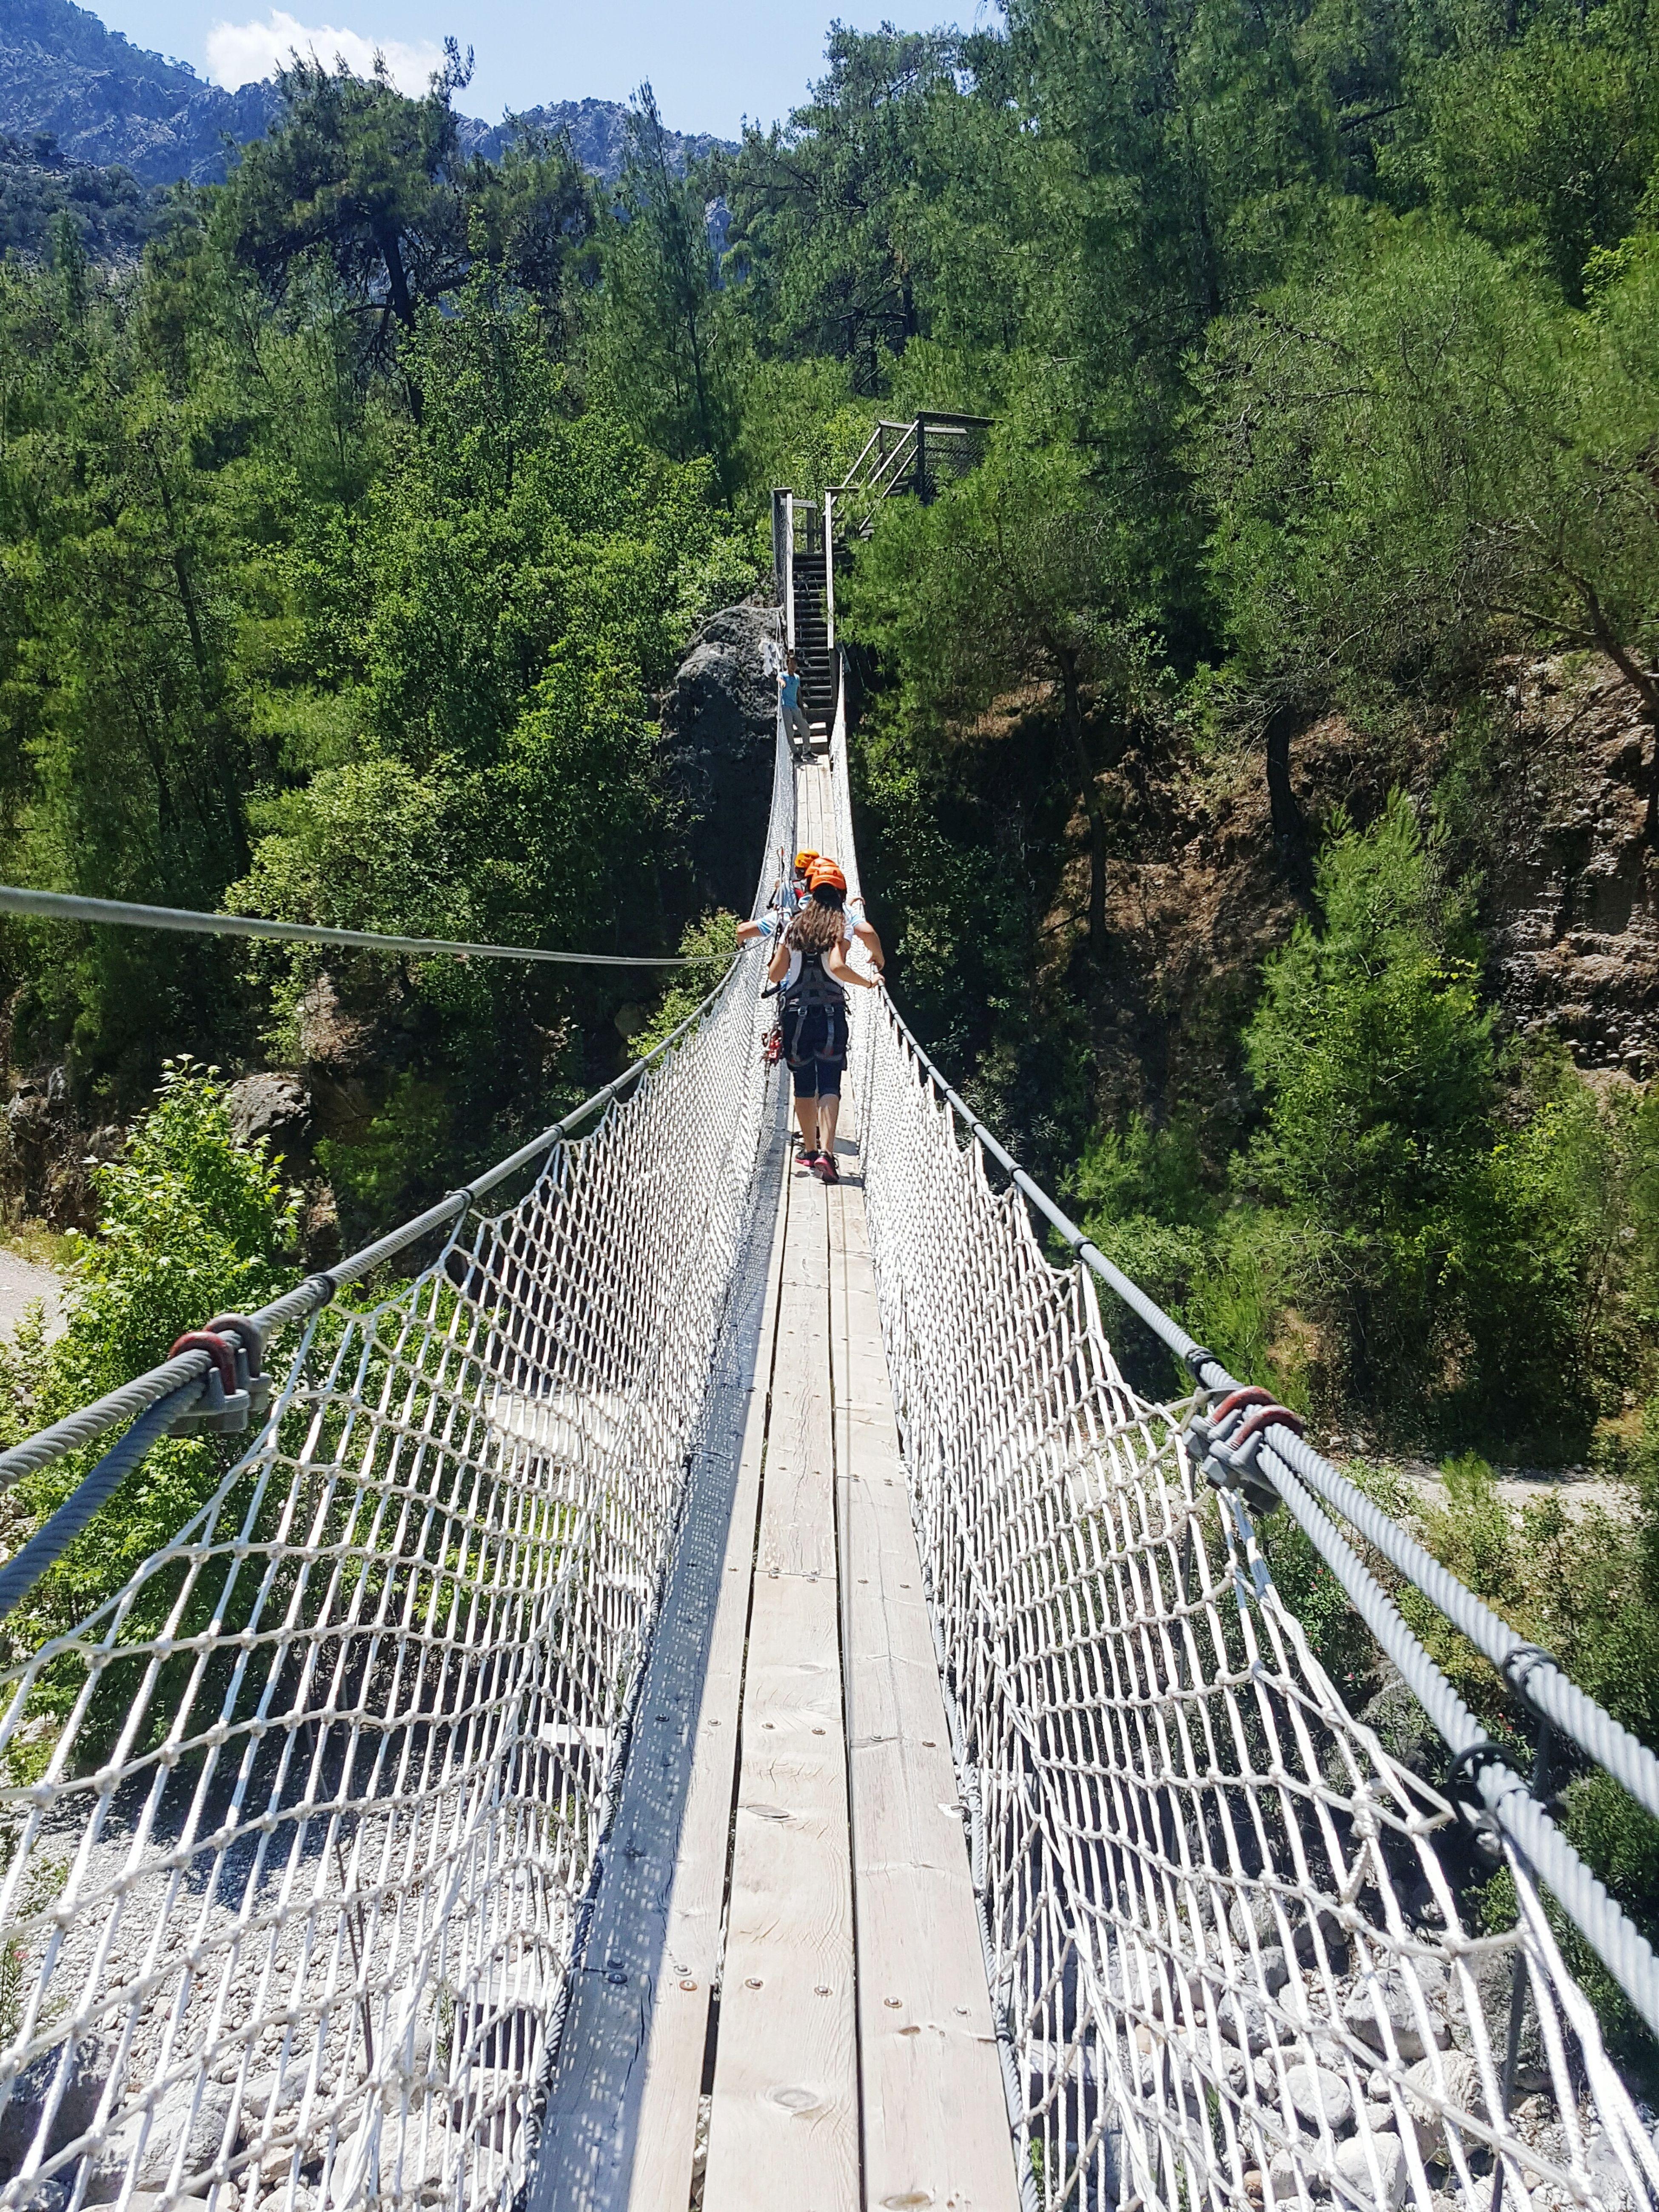 Göynük Kanyonu Zip Line Adrenalin Kopru